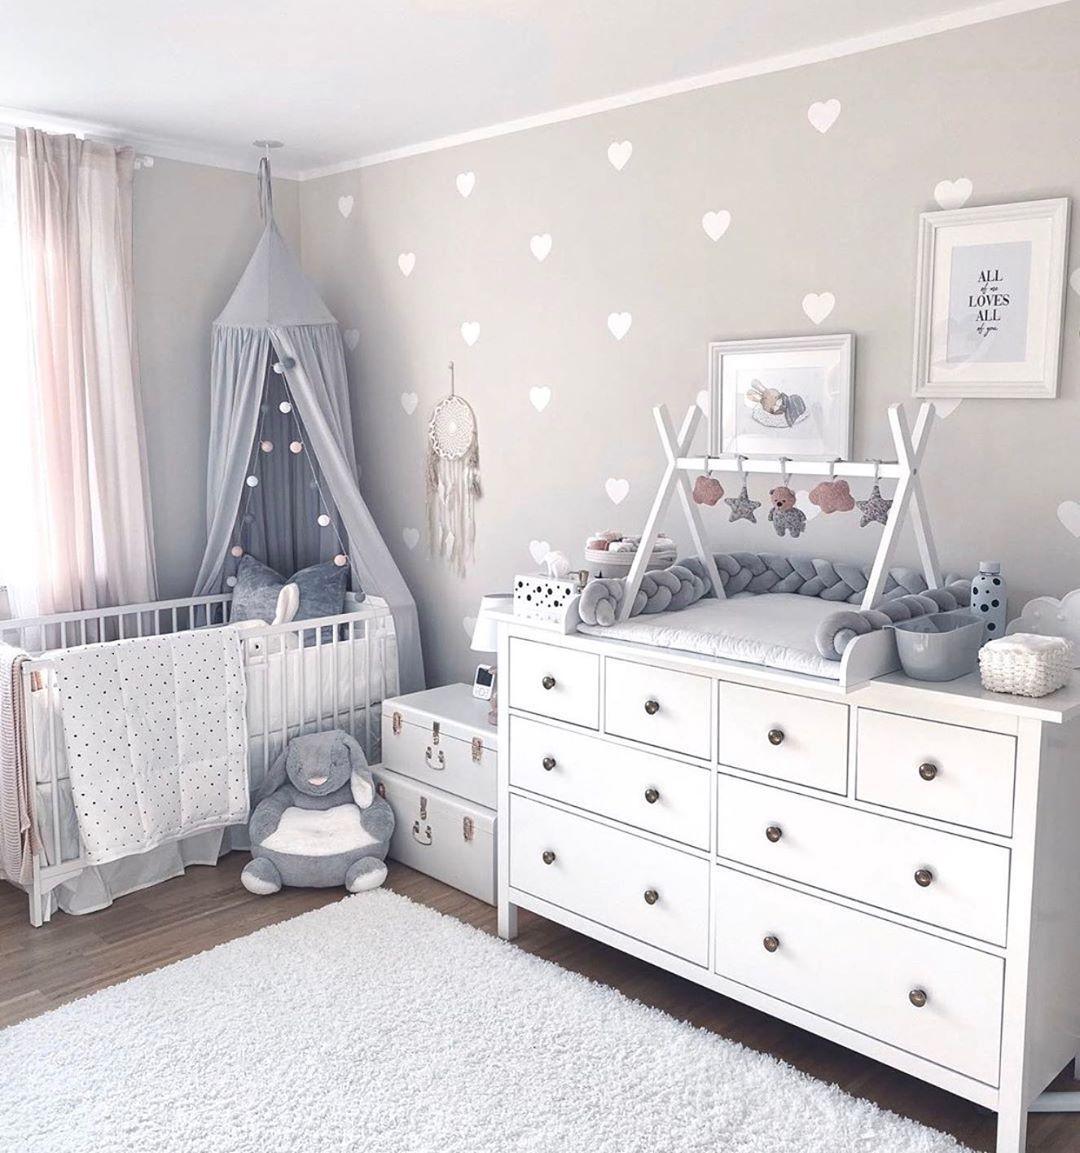 IKEA Deutschland on Instagram: Traumstart in die Elternzeit. Vielen Dank @t.a.n.n.n.y #Regram #Kommode #HEMNES #Sessel #STRANDMON #meinIKEA